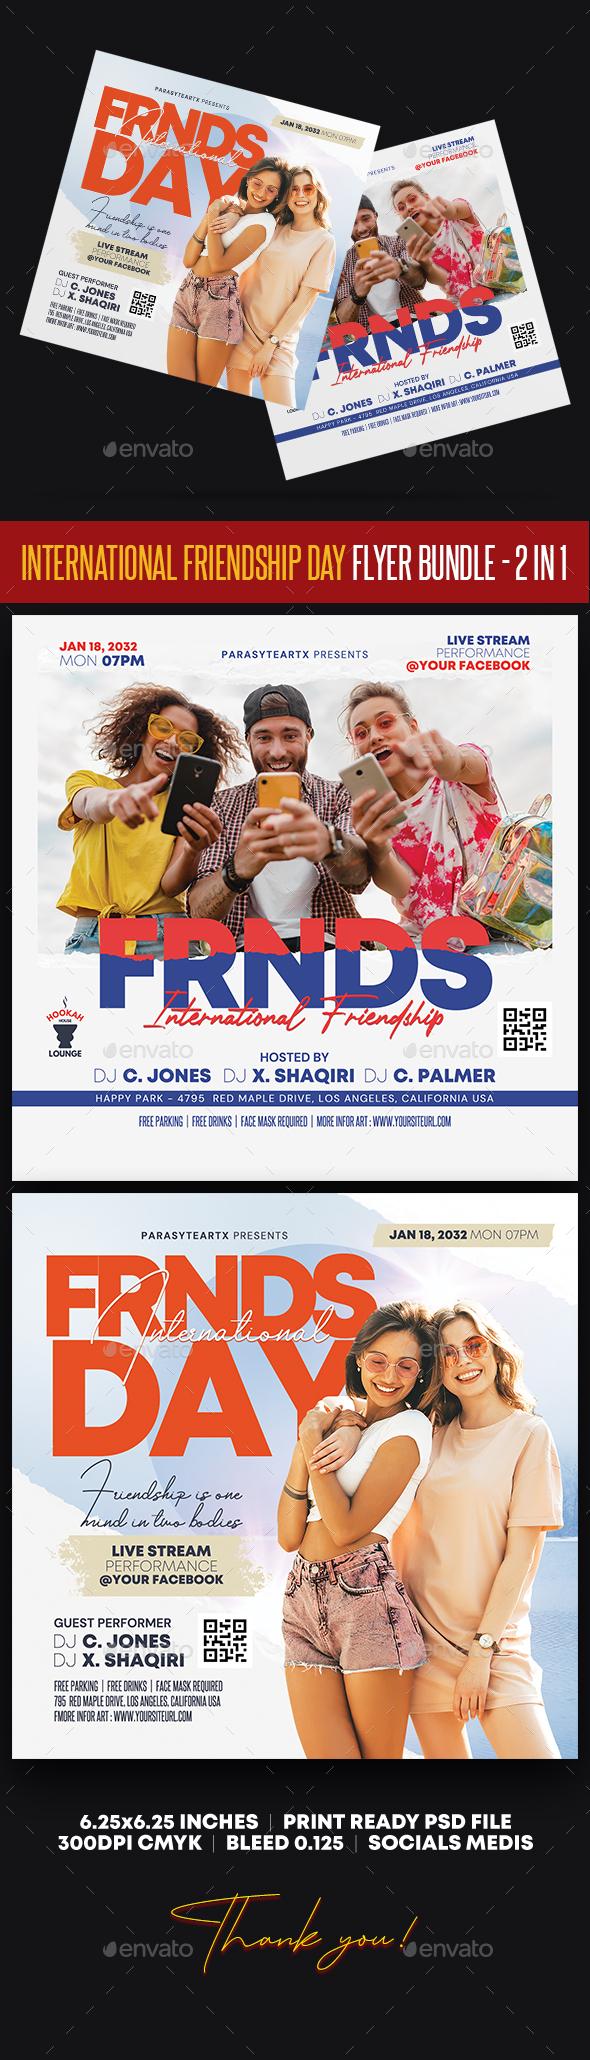 International Friendship Day Flyer Bundle